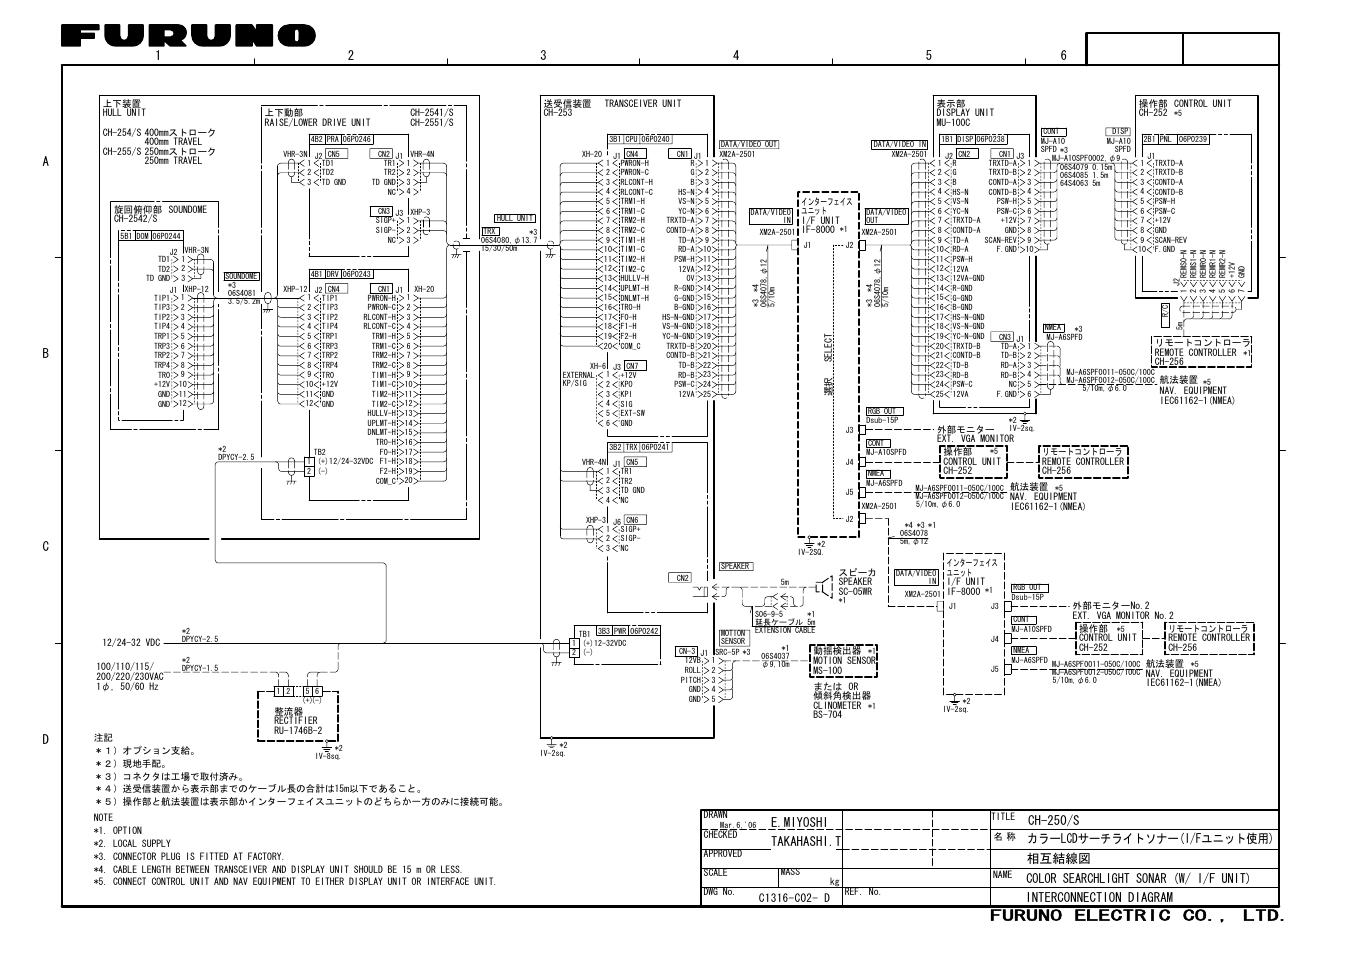 Furuno electric co., ltd, E.miyoshi takahashi.t, Color